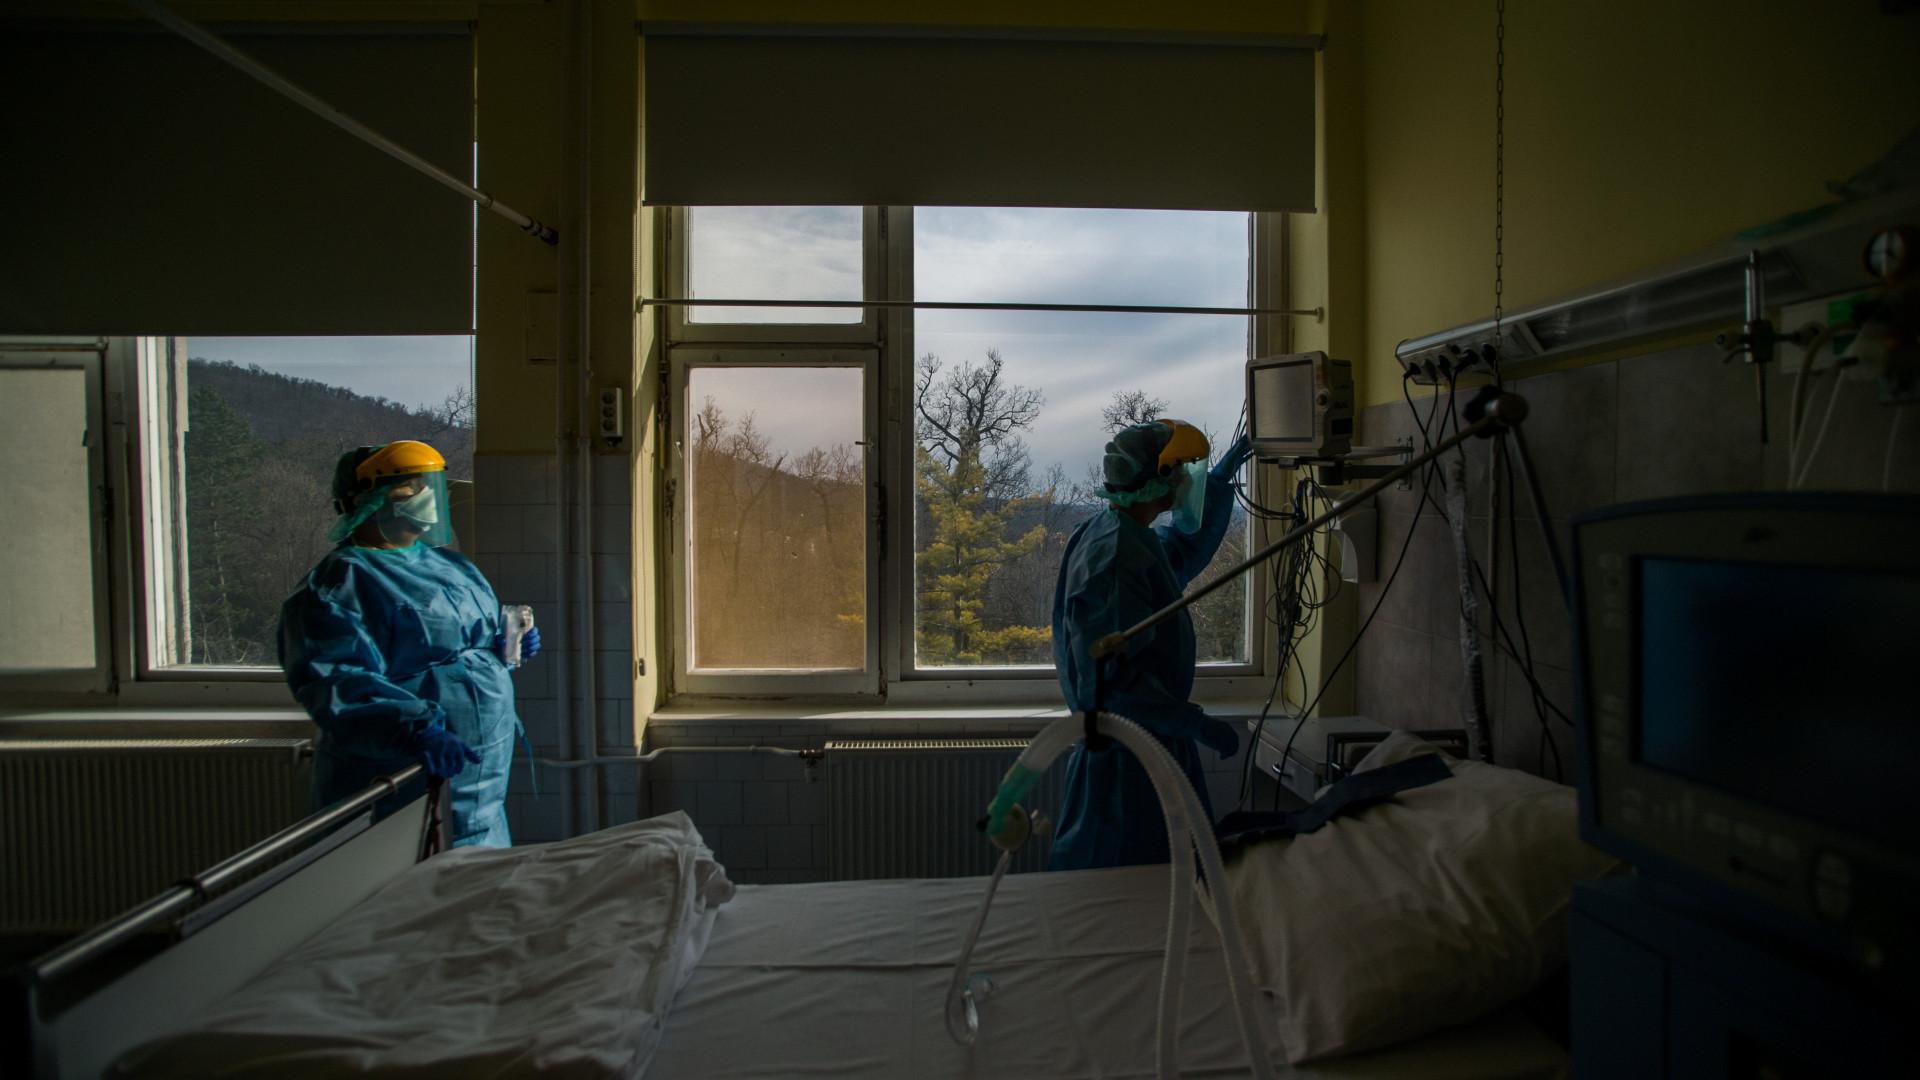 koranyi intezet koronavirus orban viktor